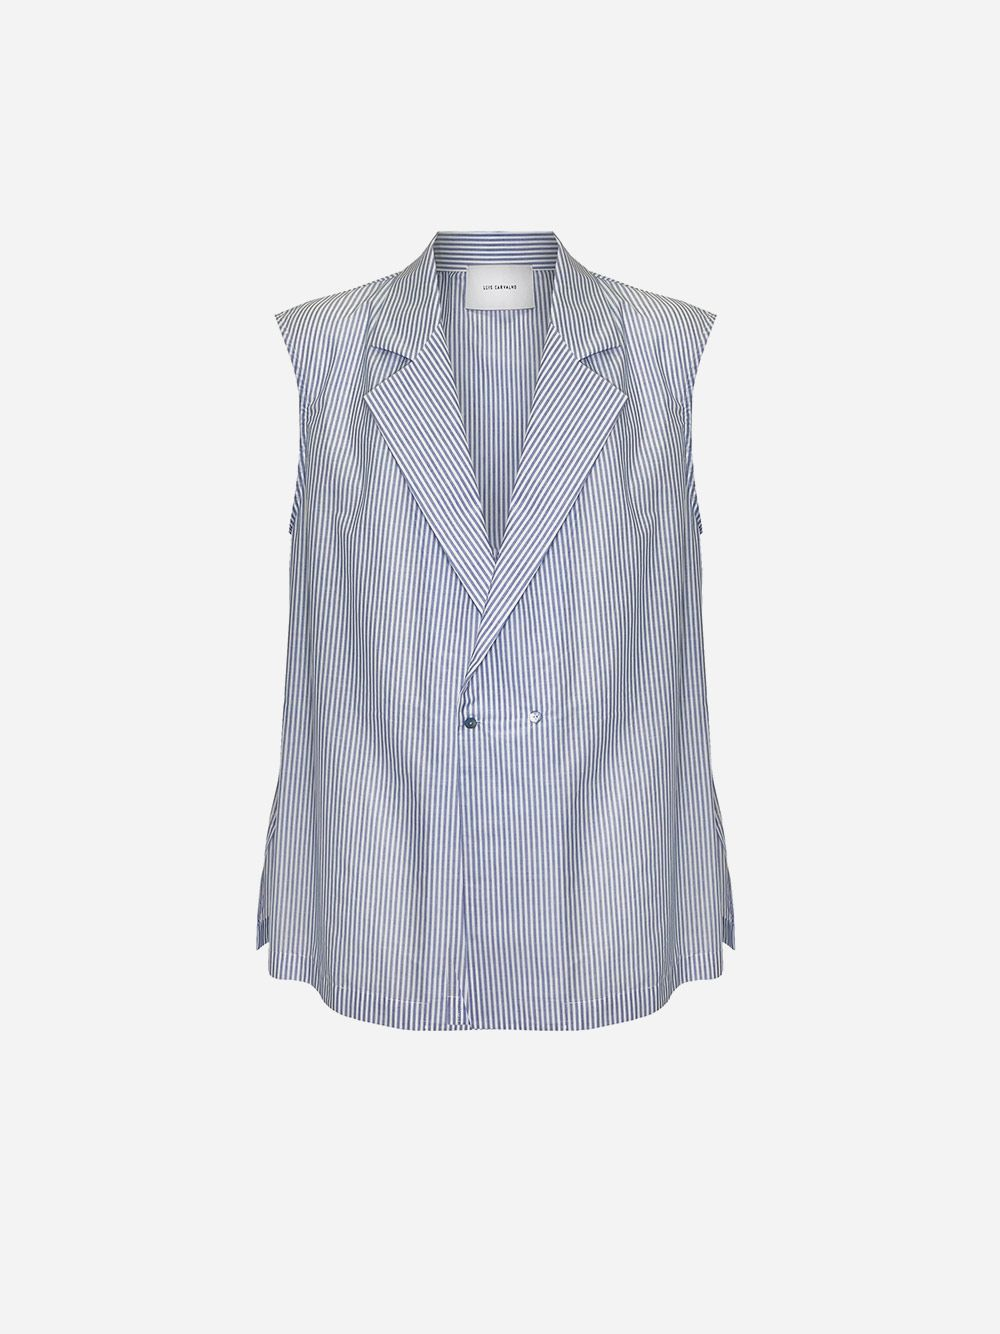 Unisex Trespass Sleeveless Shirt